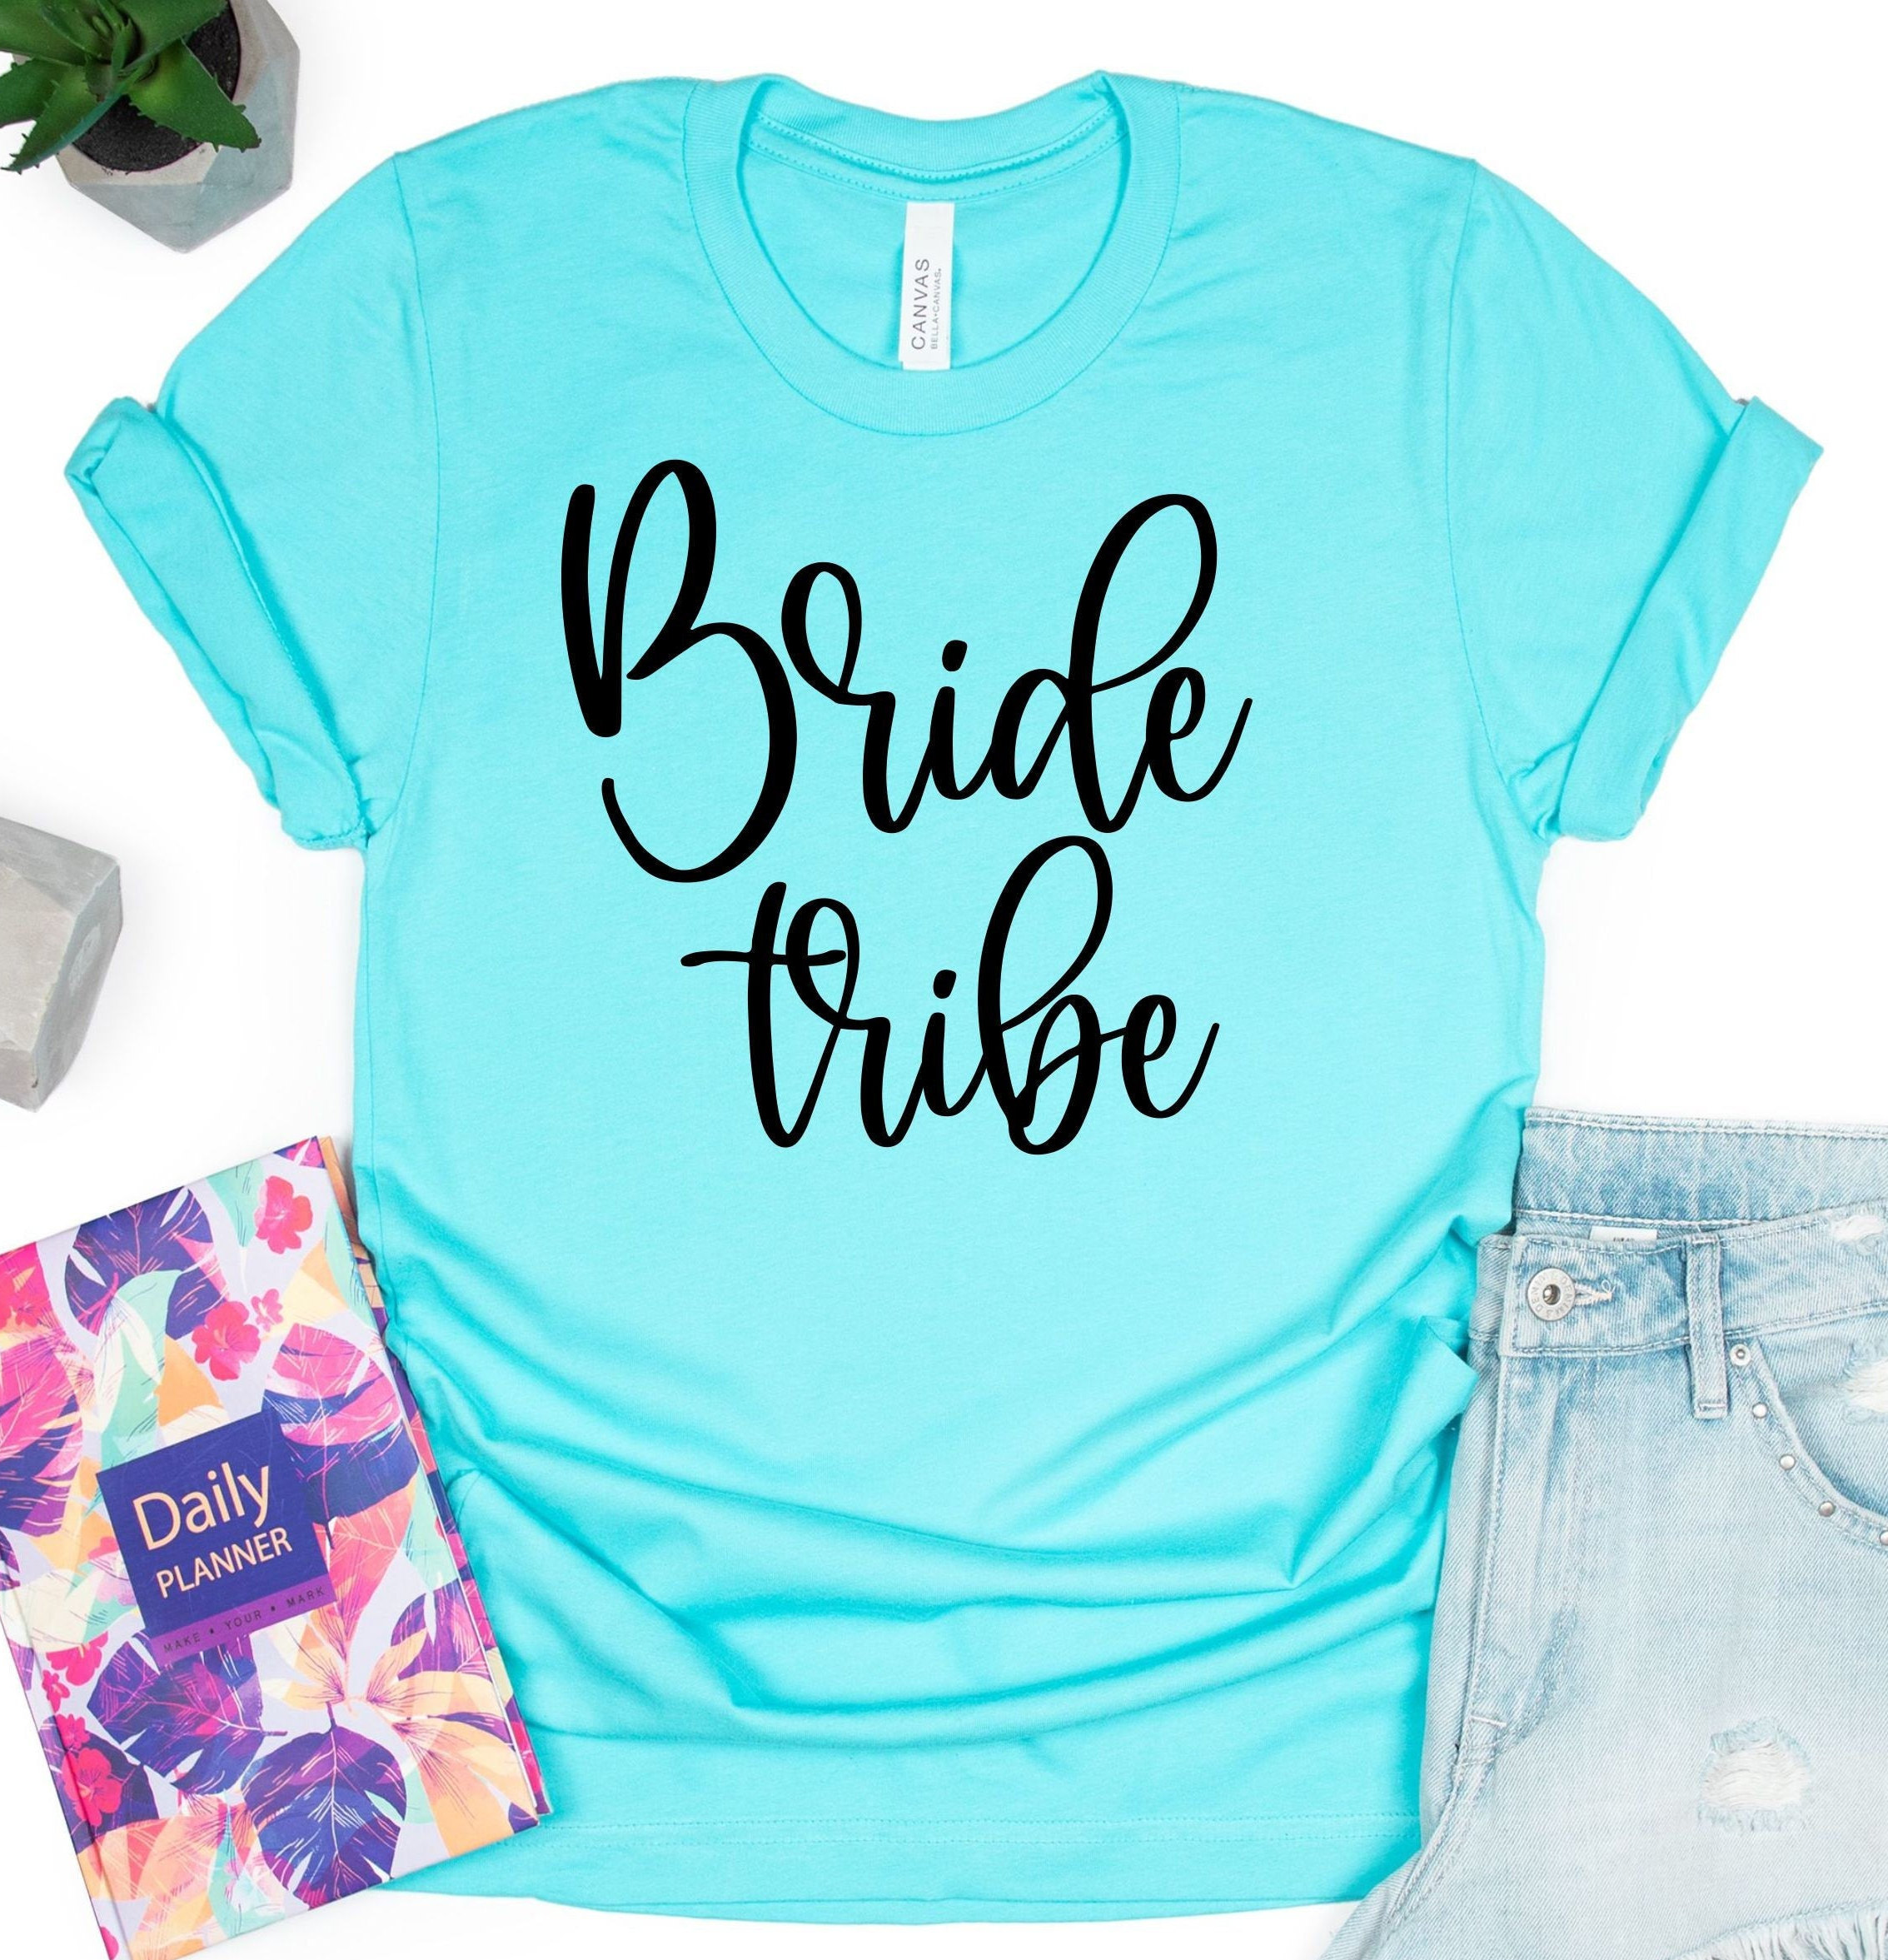 Bride-tribe-svg-squad-svg-bridesmaid-svg-bridal-party-svg-bride-svg-wedding-svg-design-bachelorette-svg-design-bridesmaid-cricut-svg-2-600a183e